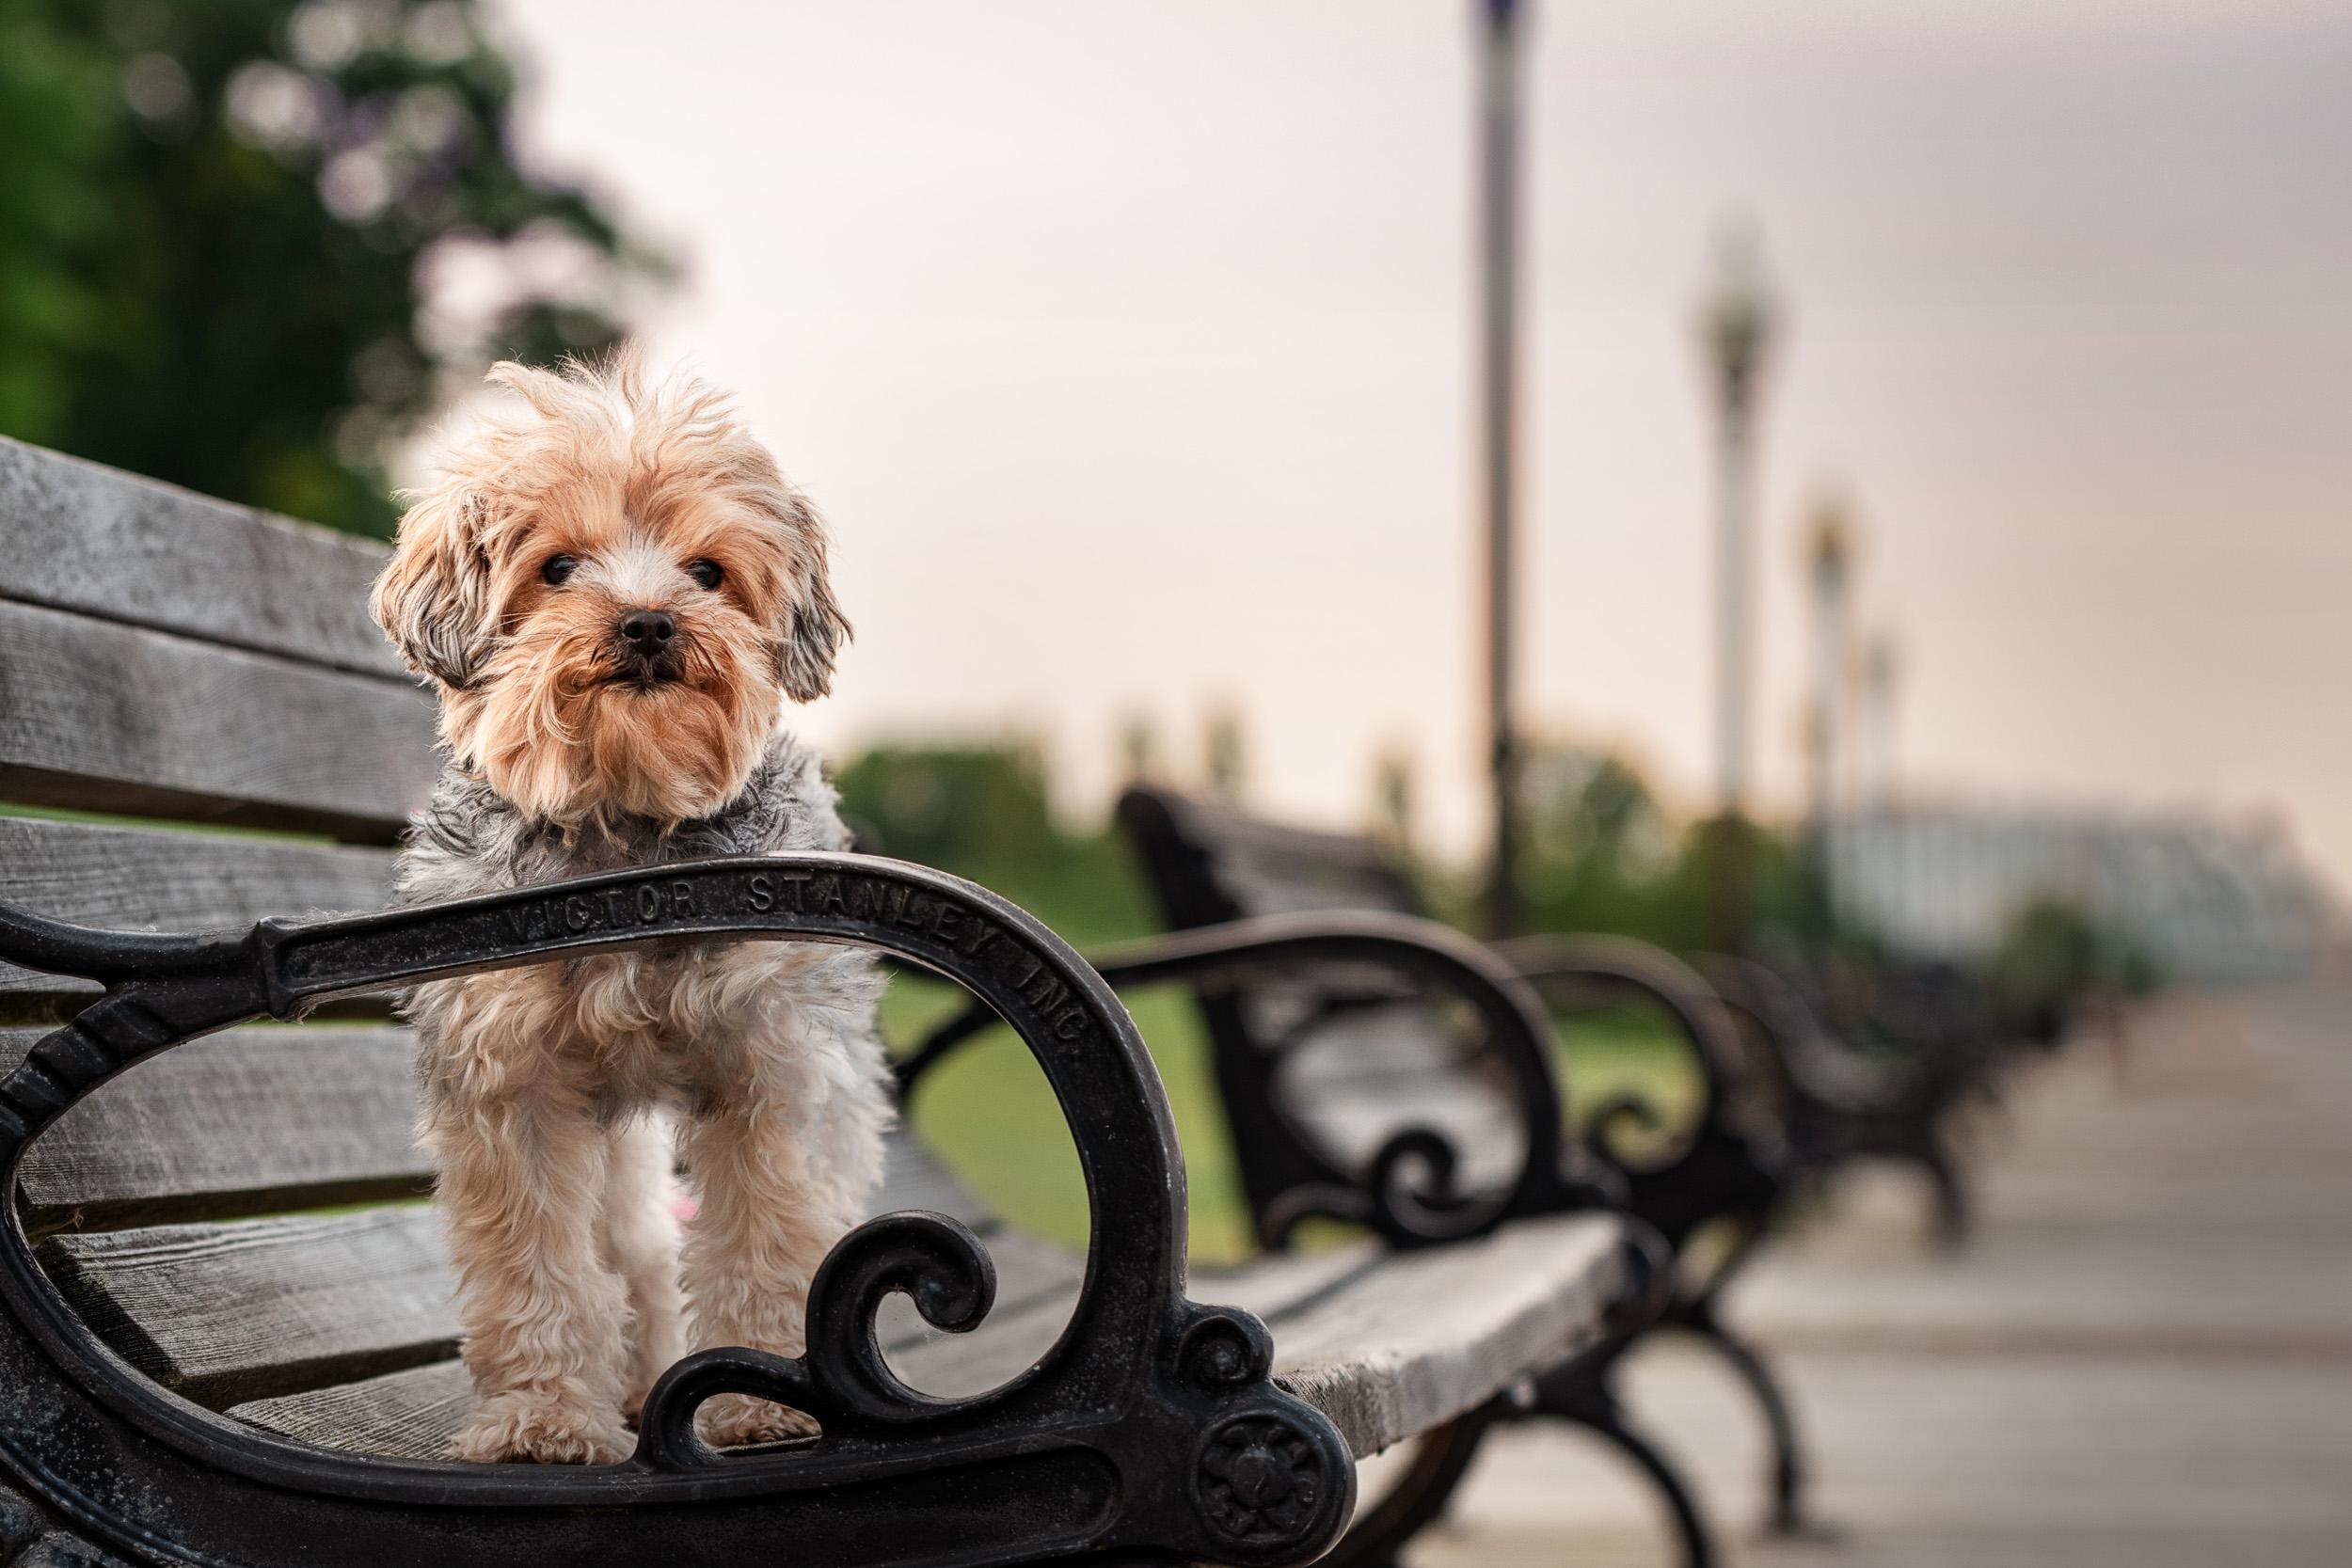 Sassy York dog - M's animals Photography